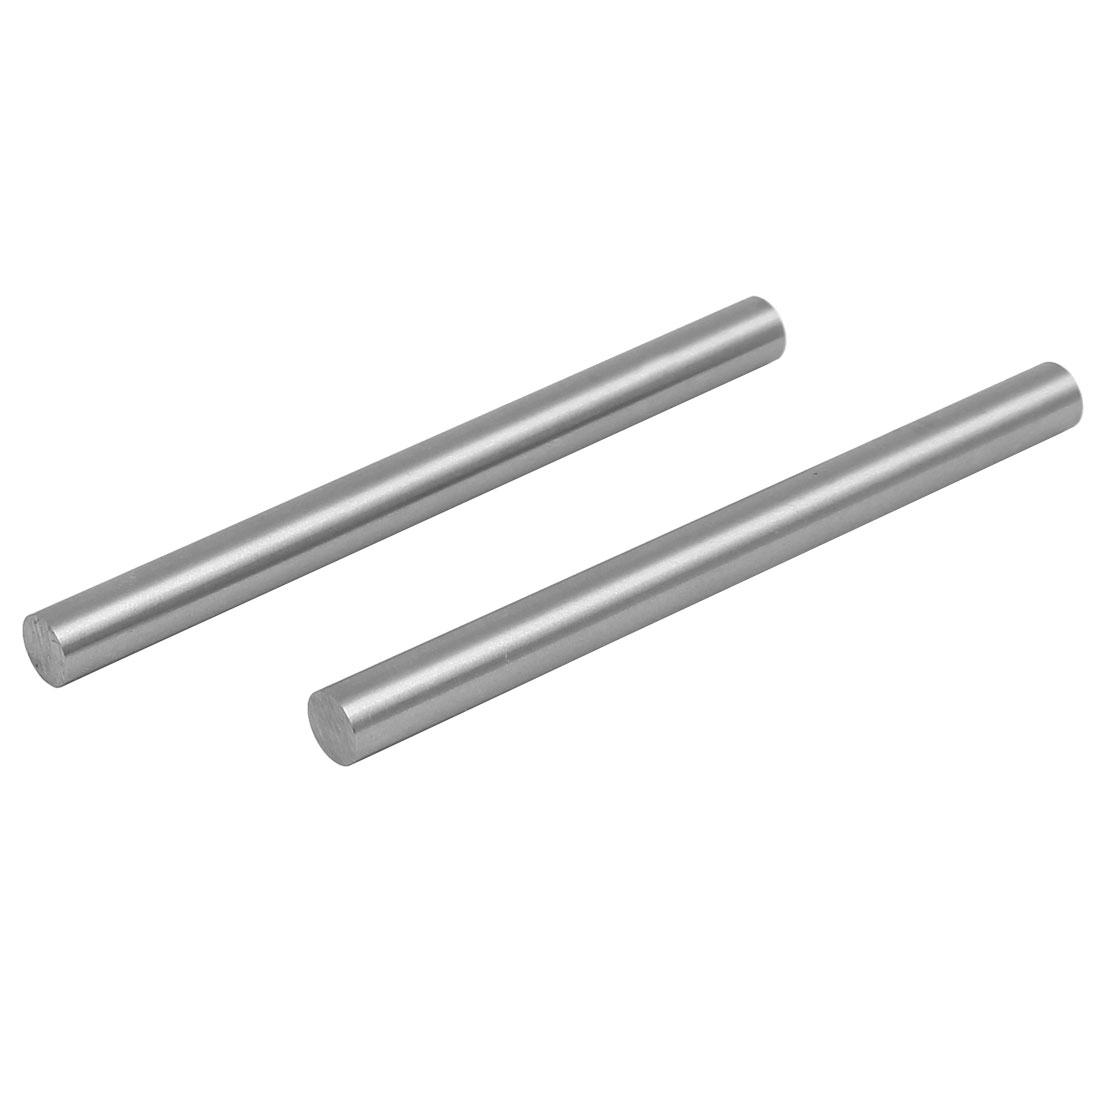 8mm Dia 100mm Length HSS Round Shaft Rod Bar Lathe Tools Gray 2pcs